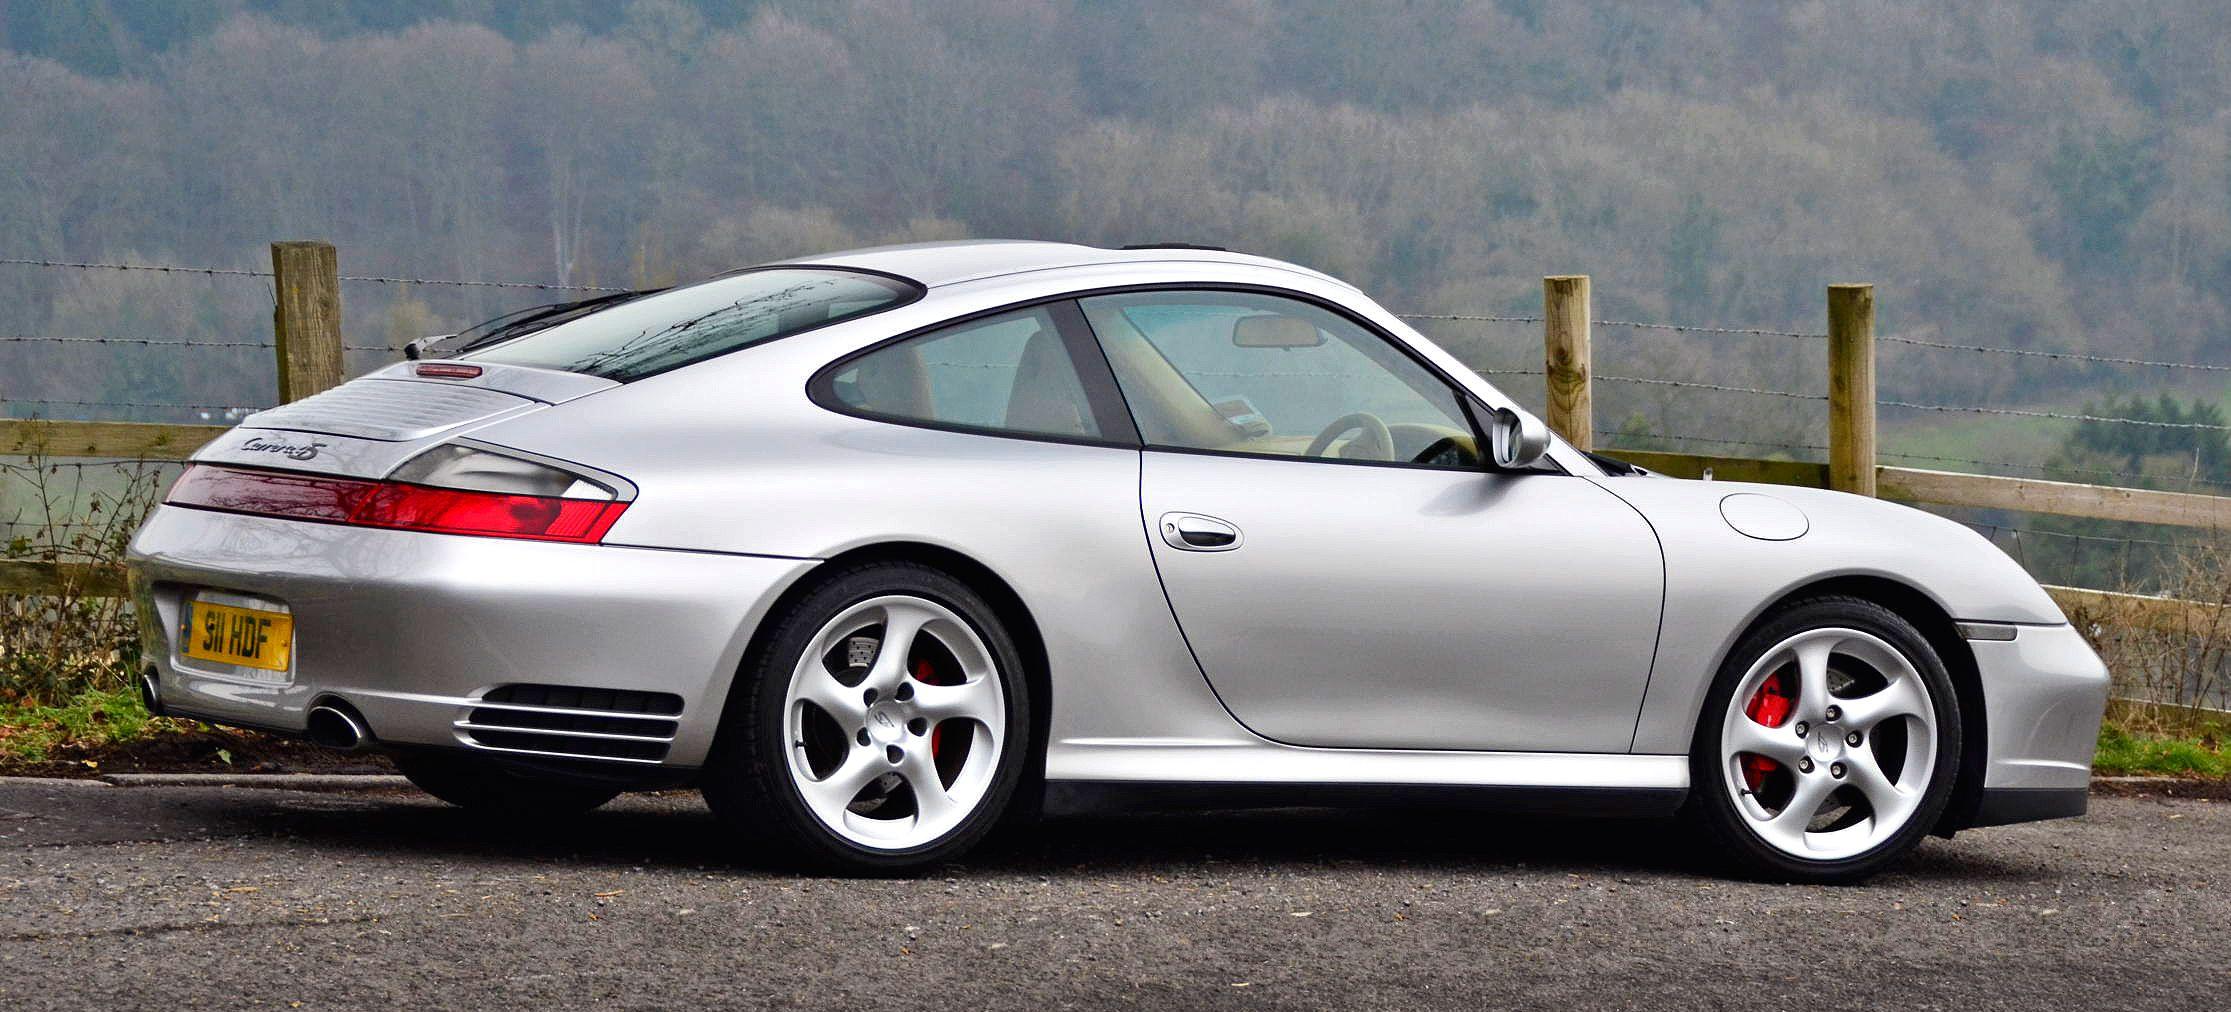 Image Result For Porsche 996 C4s Porsche Dream Cars Bmw Car